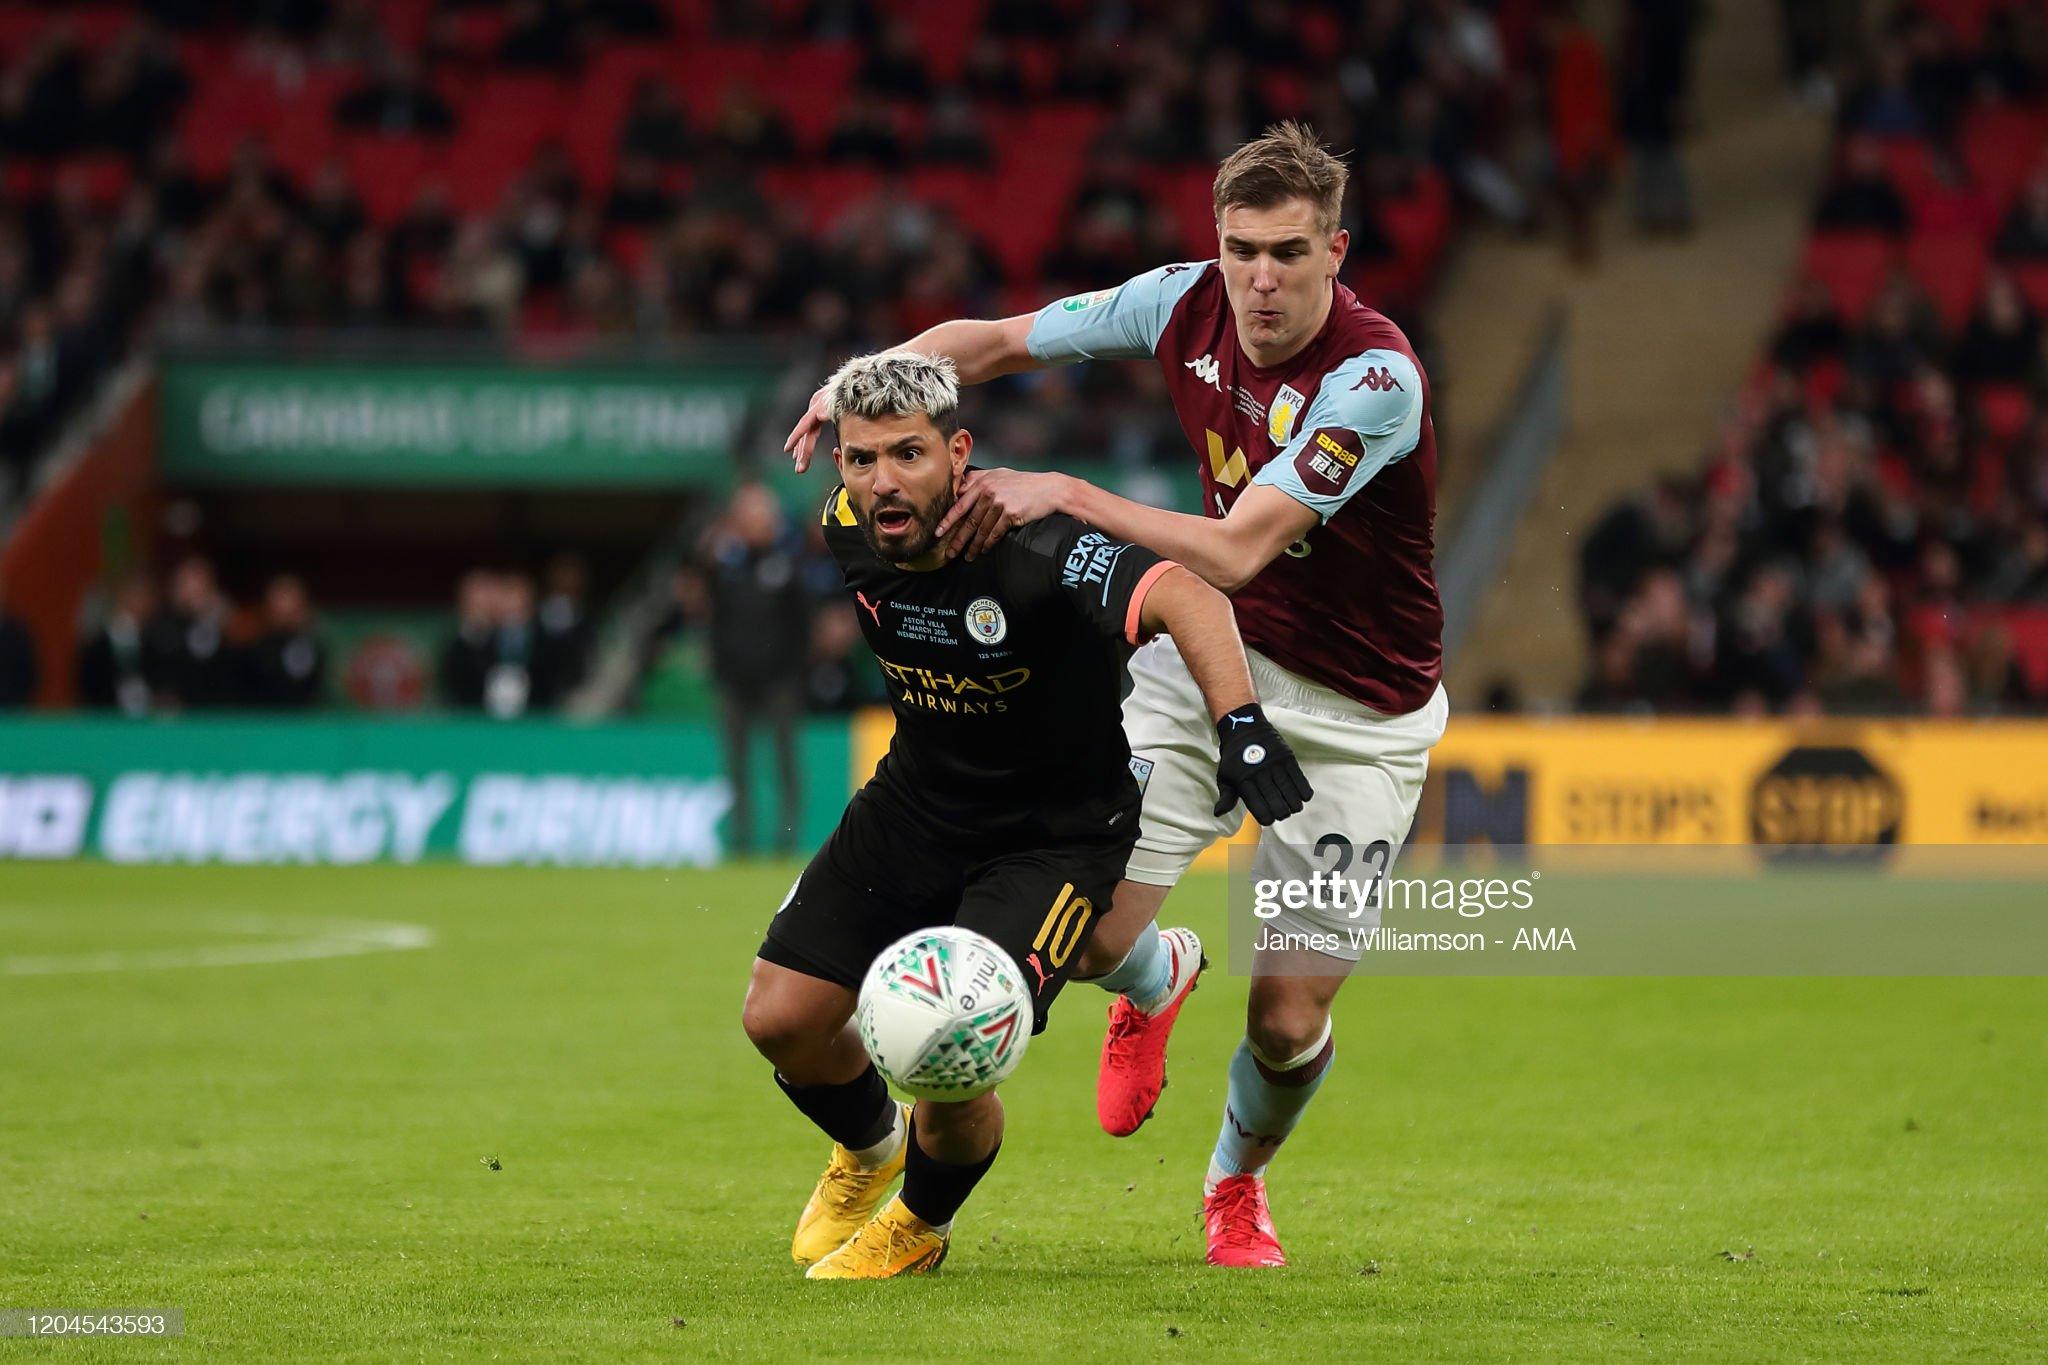 Aston Villa vs Manchester City preview, prediction and odds